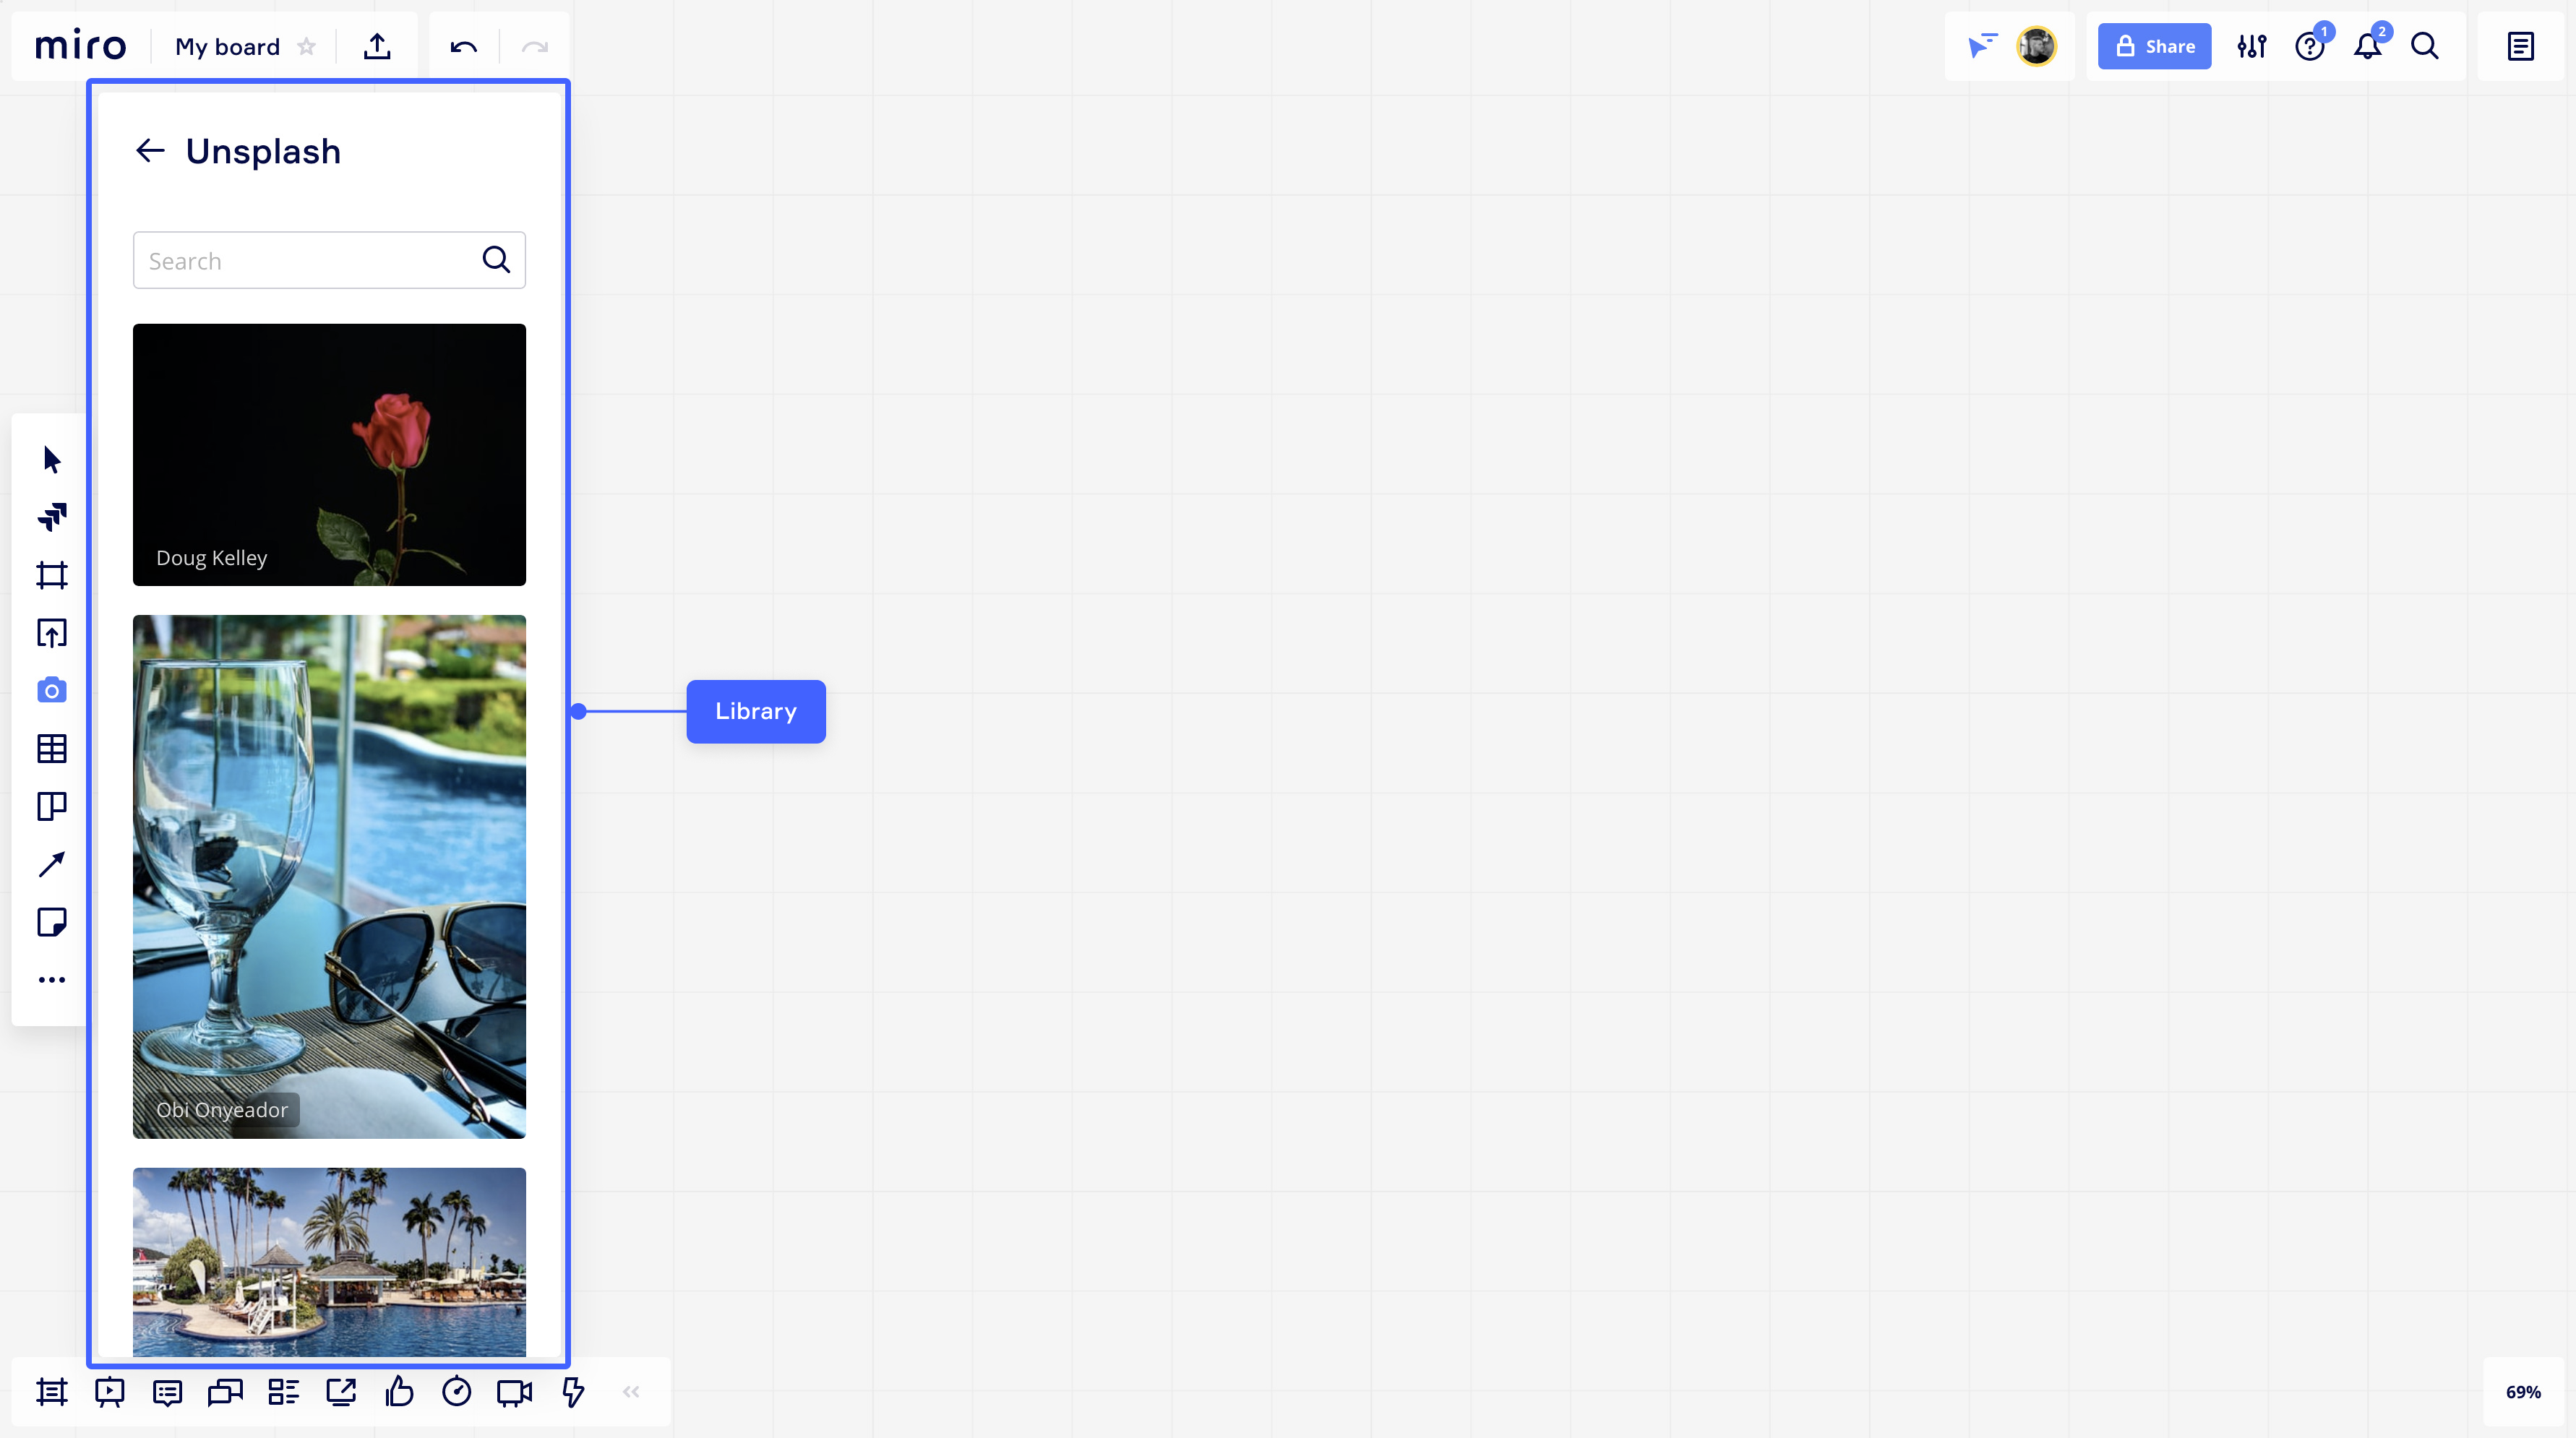 Example apps: Unsplash, IconFinder, AWS icon set